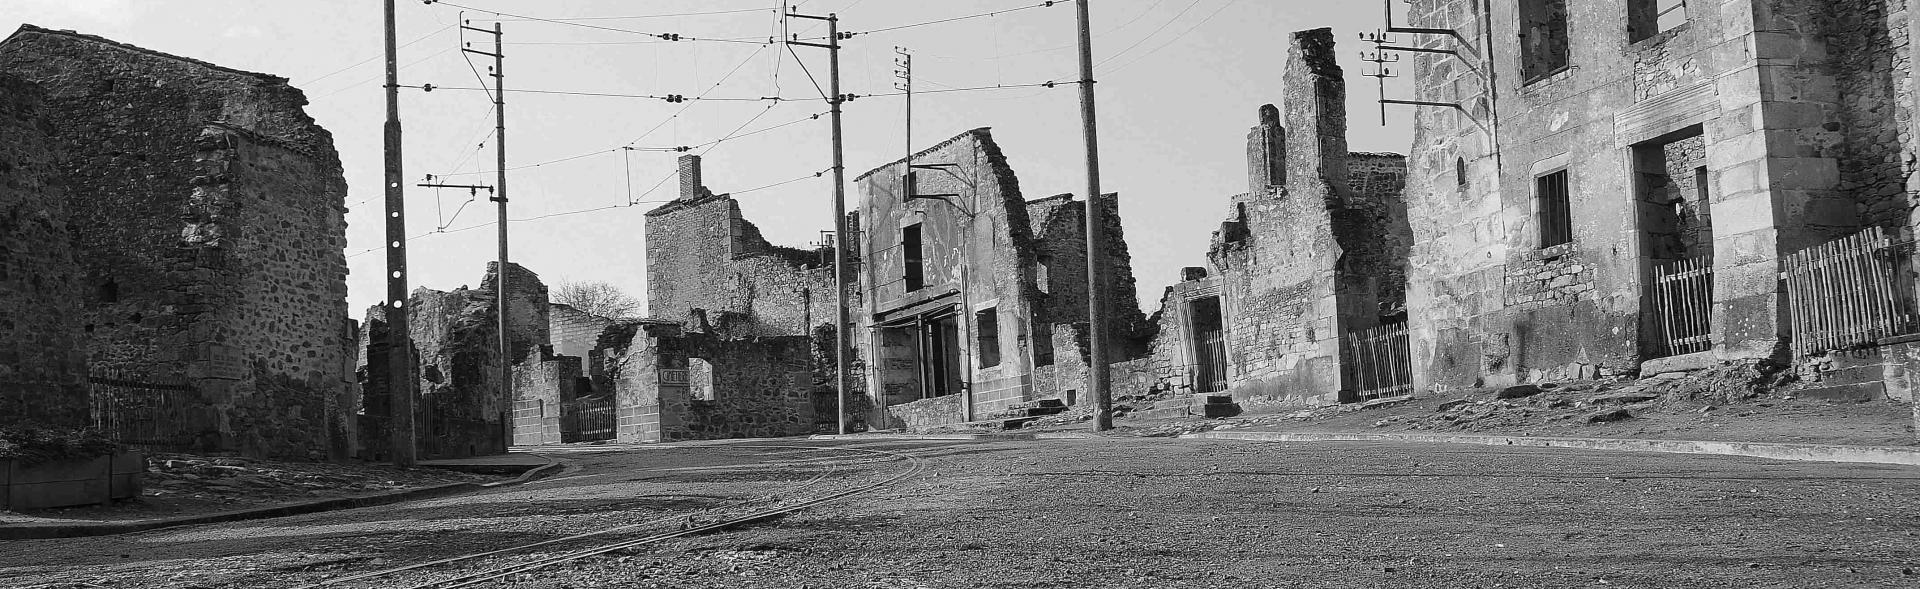 Le village martyr d'Oradour